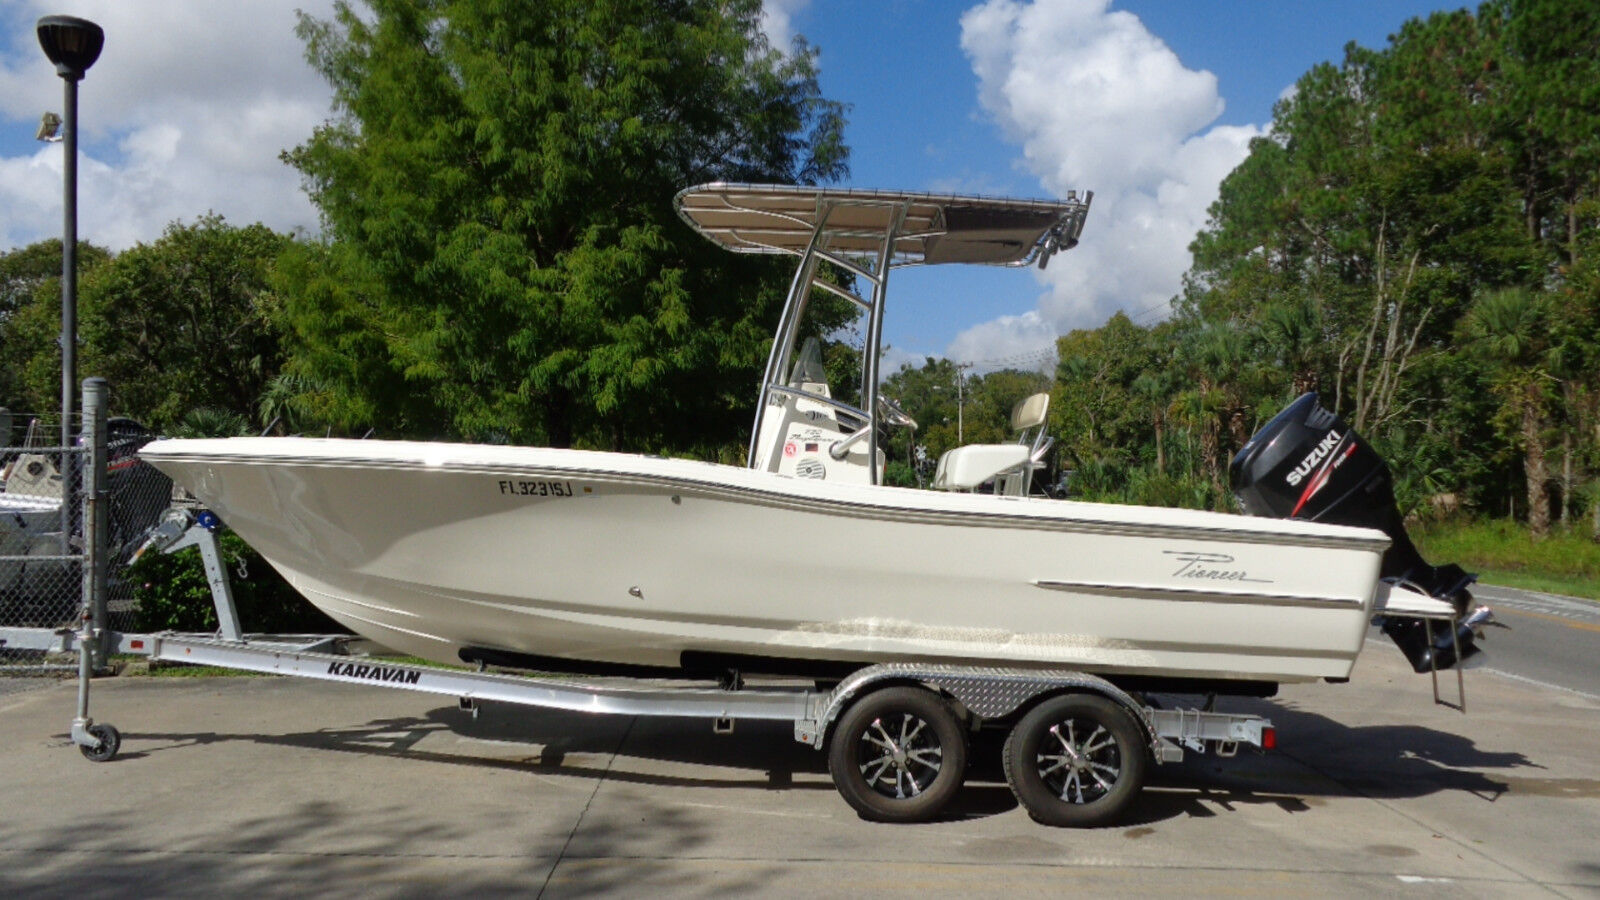 VERY NICE 2013 PIONEER 220 BAY SPORT CC FISHING BAY BOAT SUZUKI 4-STROKE 175 HP